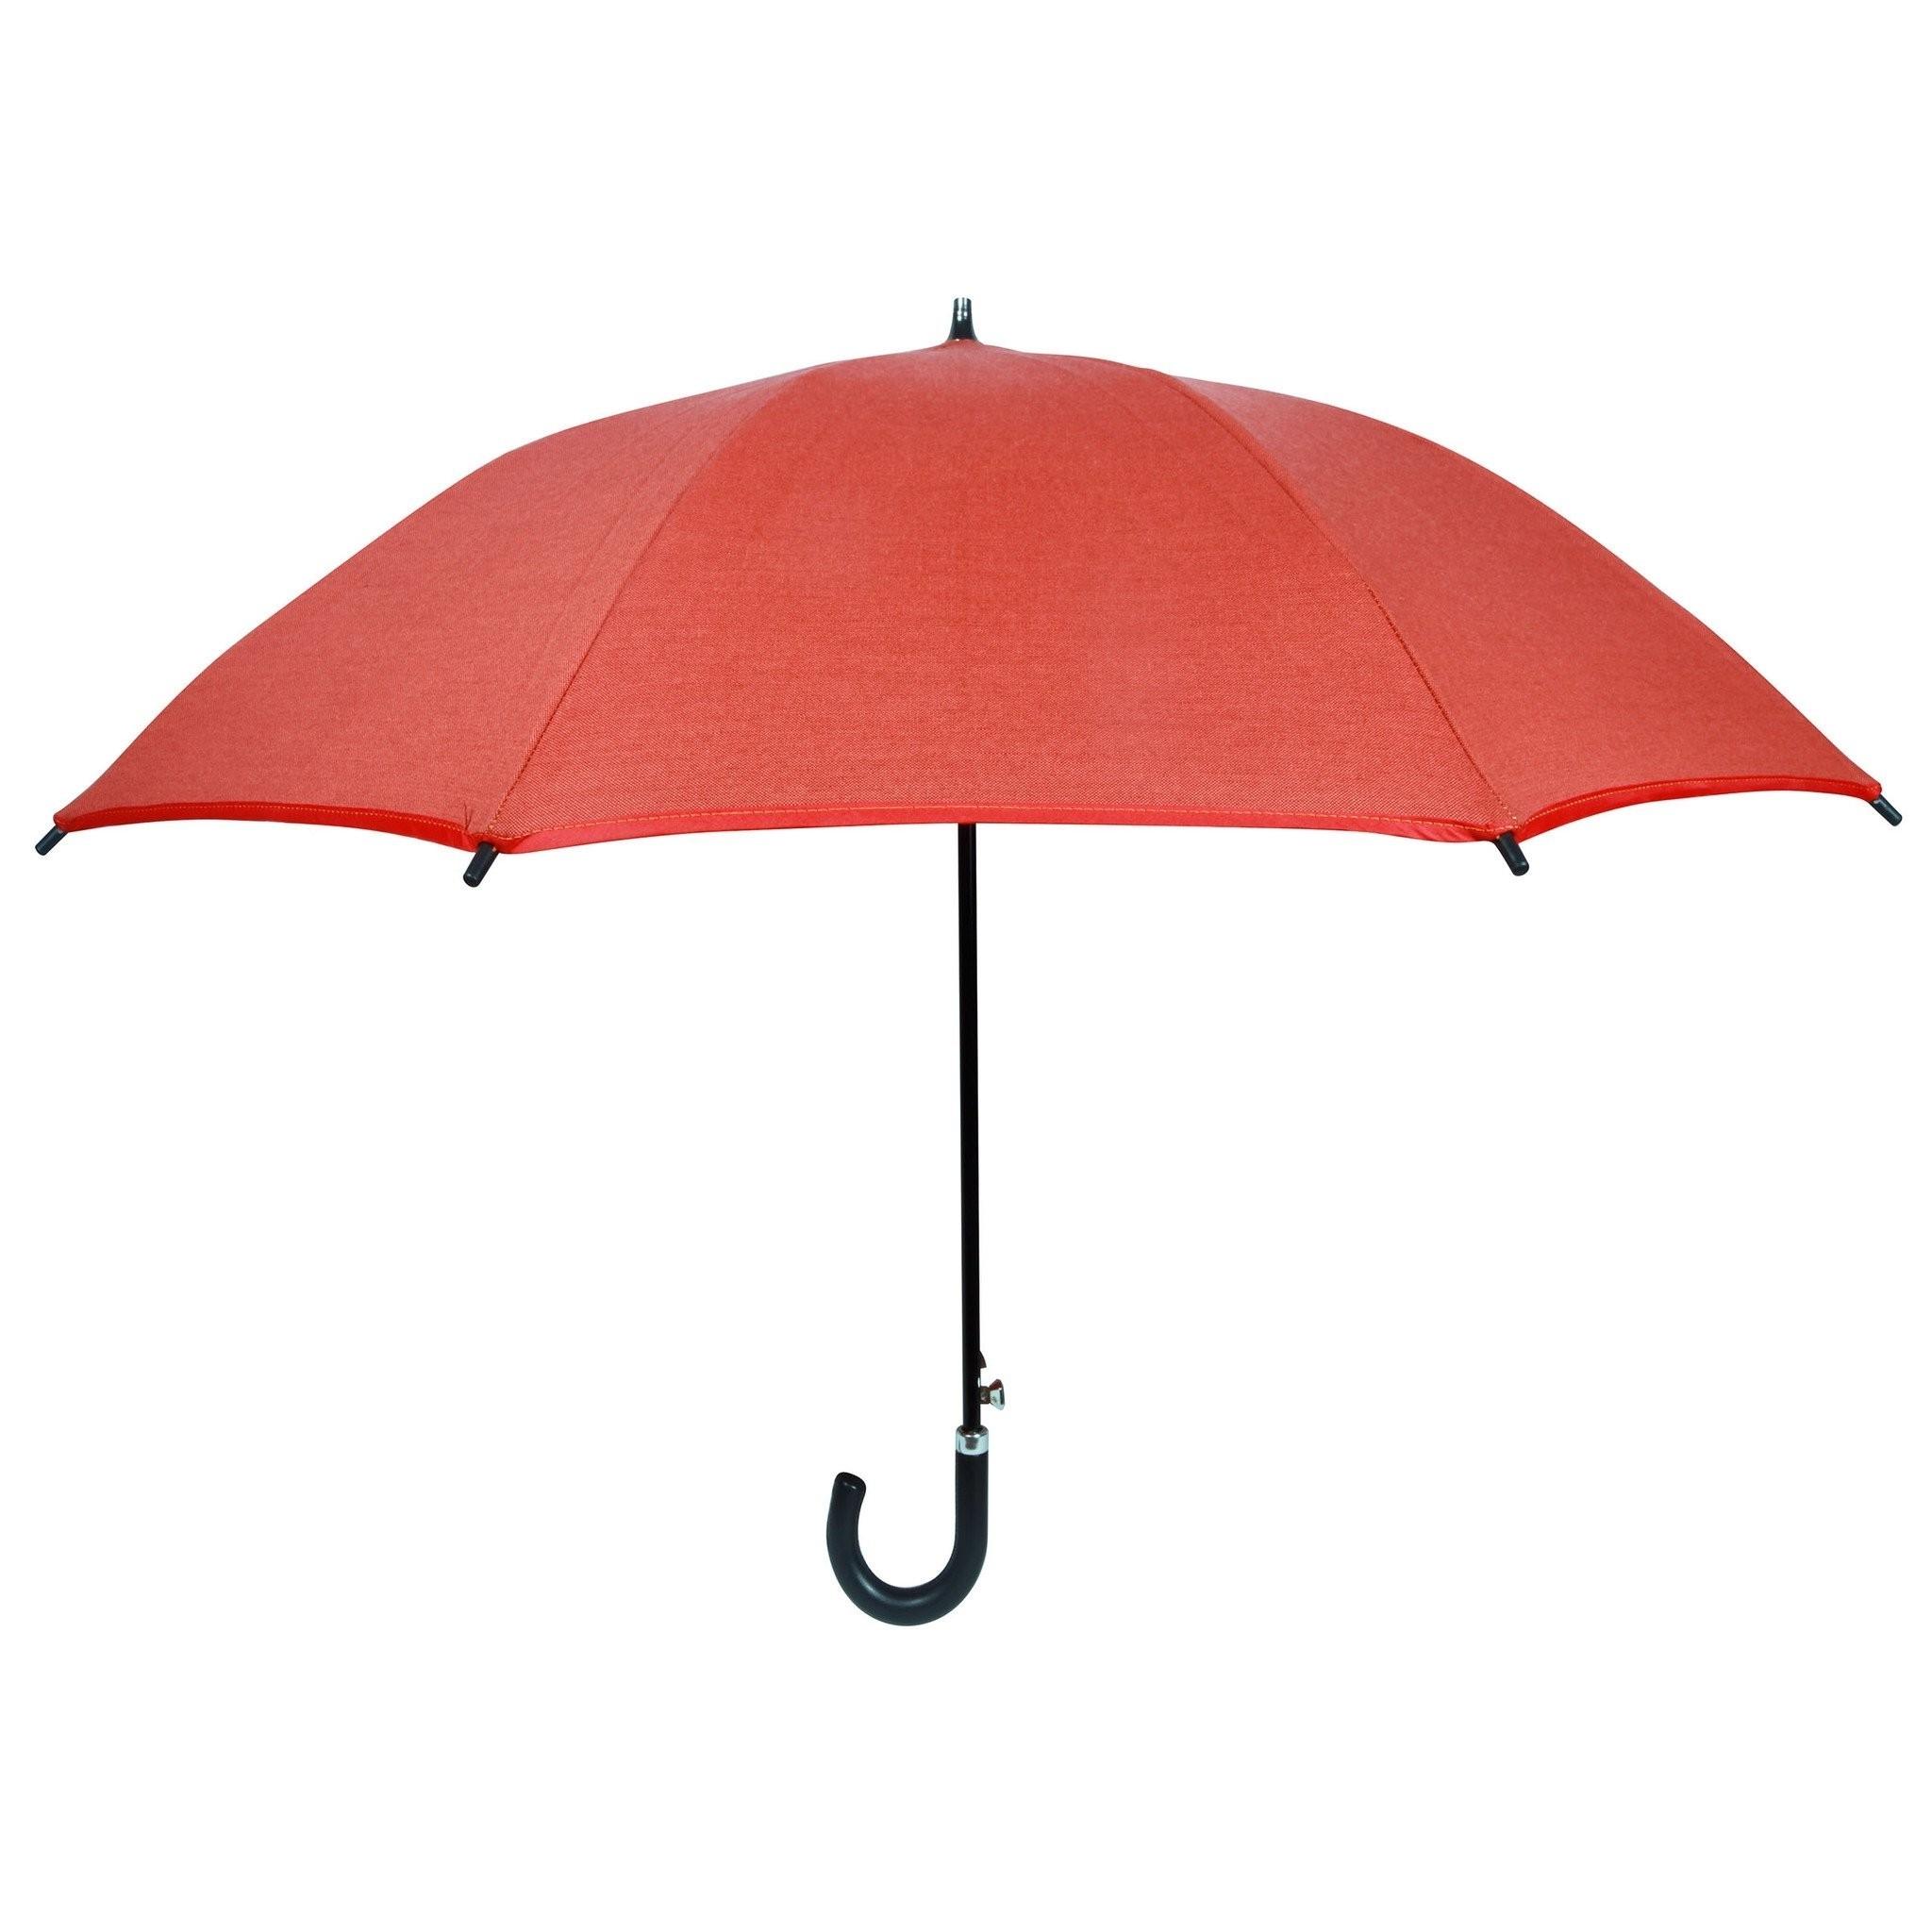 Sunset Orange Sun And Rain Umbrella Featuring Sunbrella Fabric The Intended For Favorite Patio Umbrellas With Sunbrella Fabric (View 20 of 20)